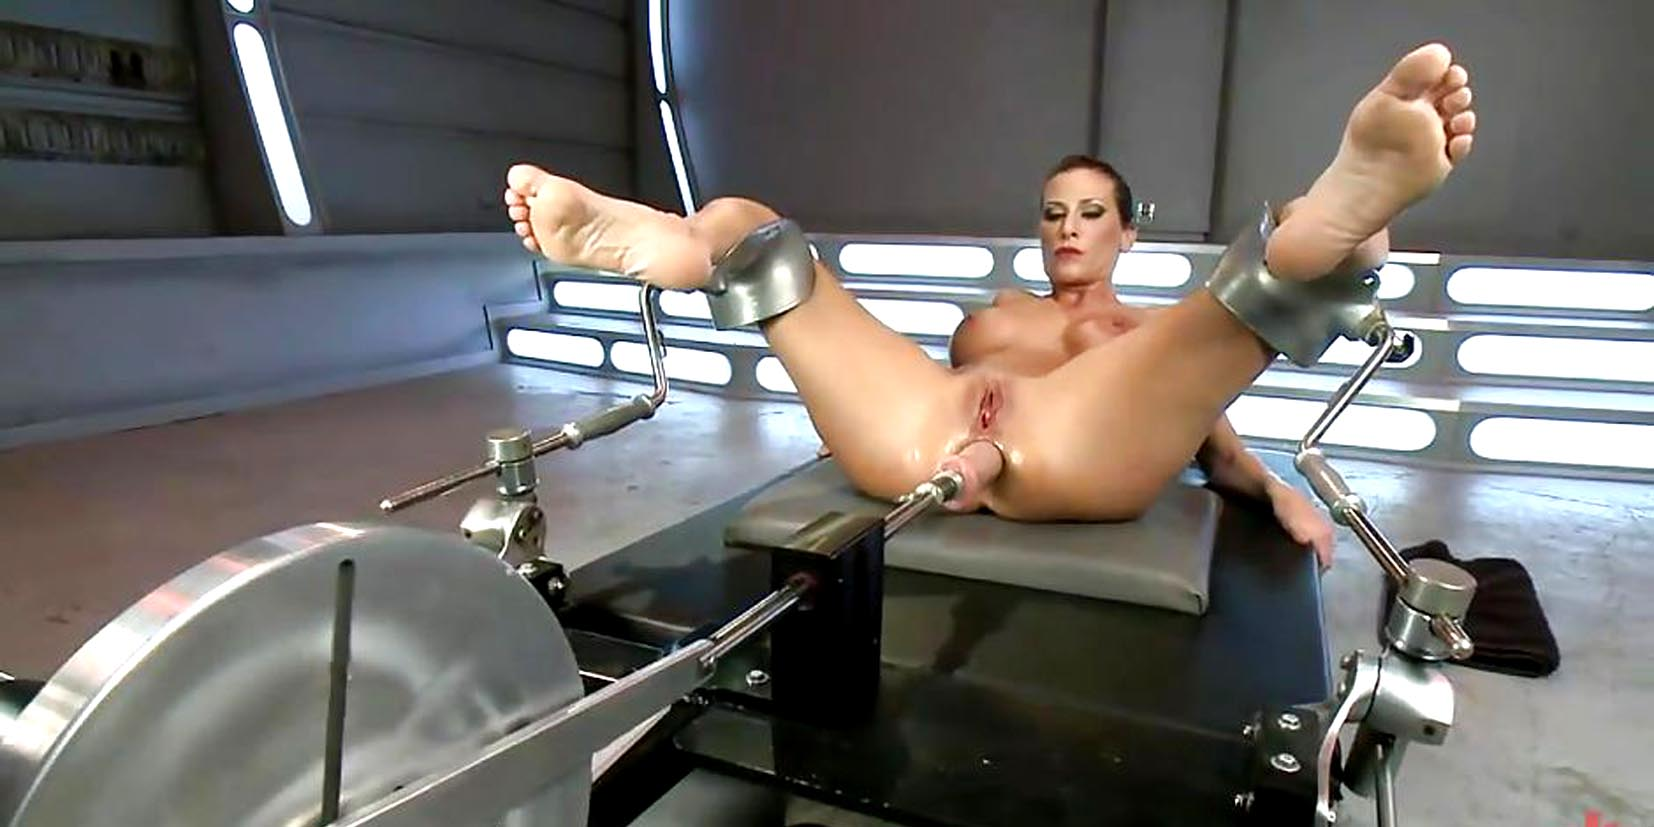 женщина исекс машина